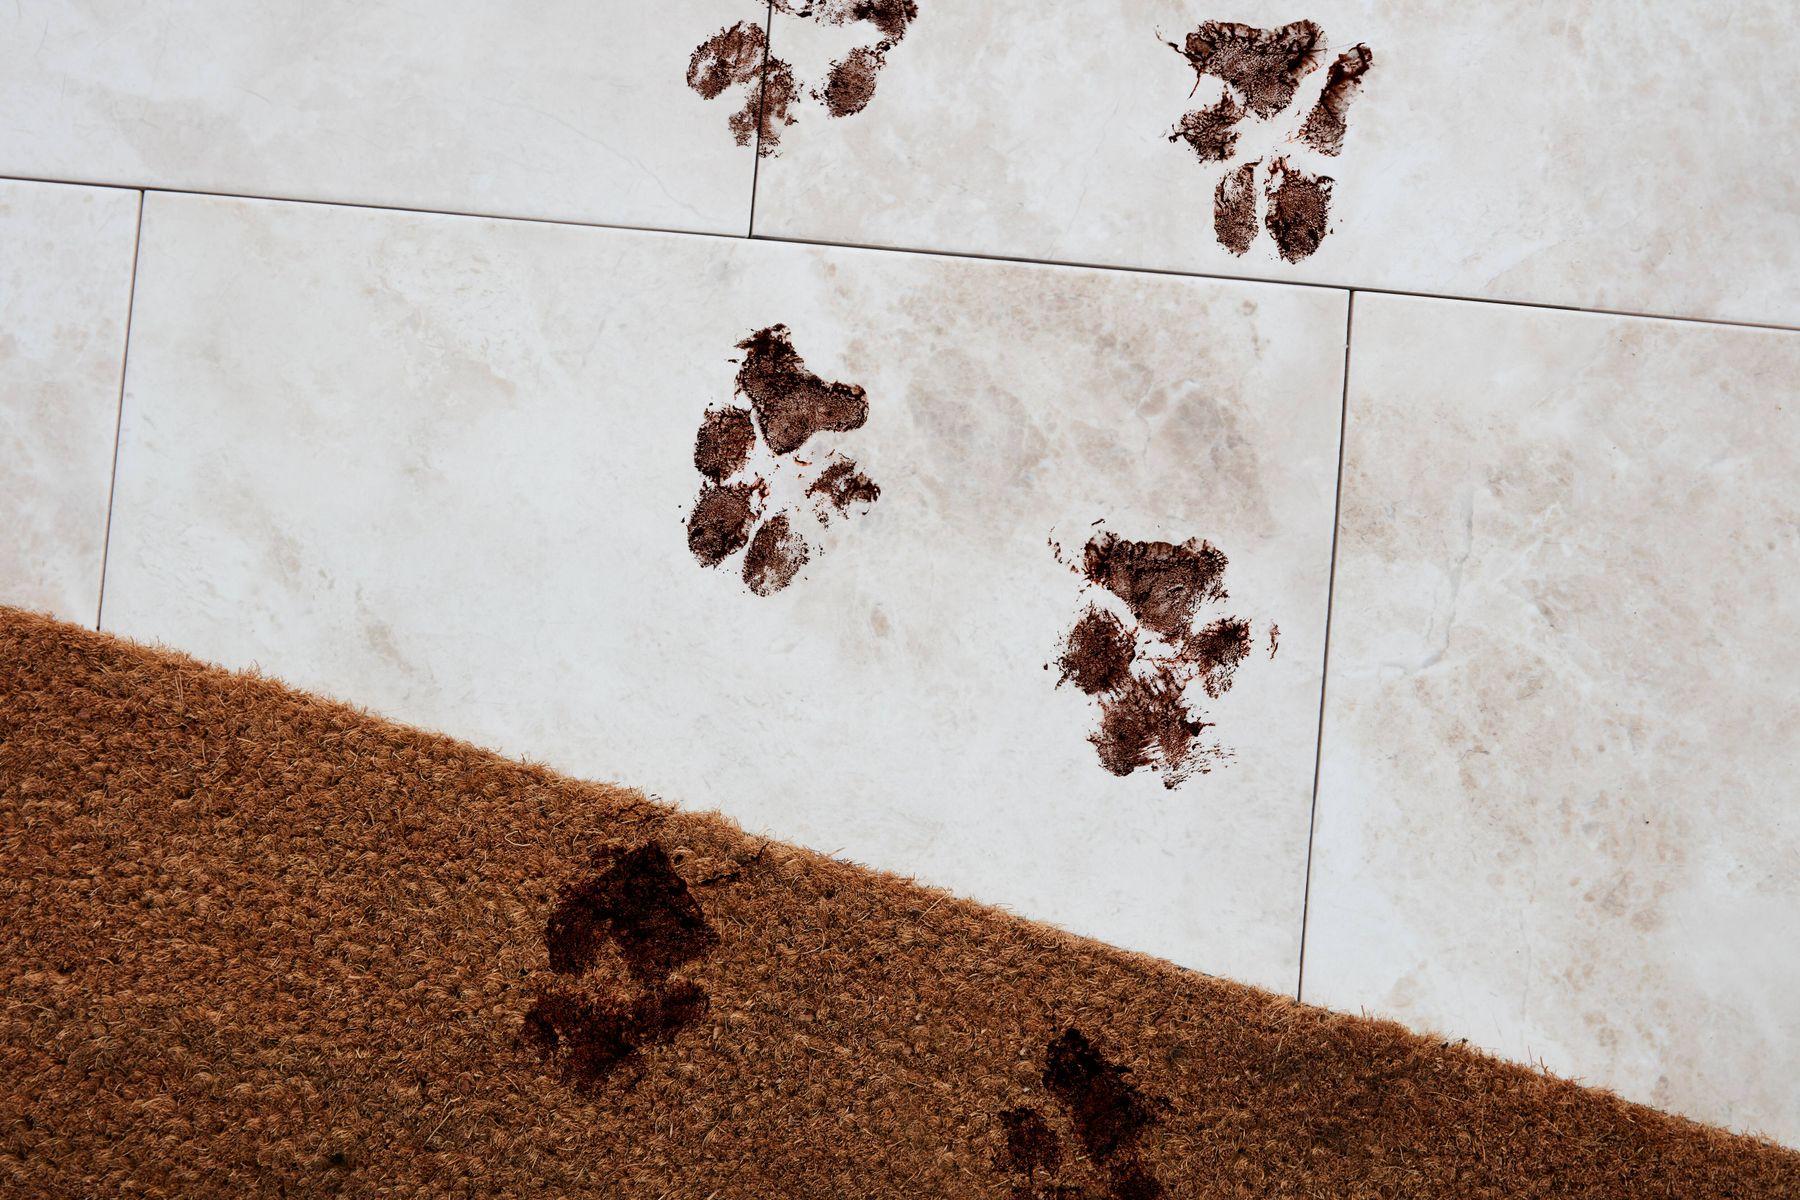 Paw prints on white tiled floor